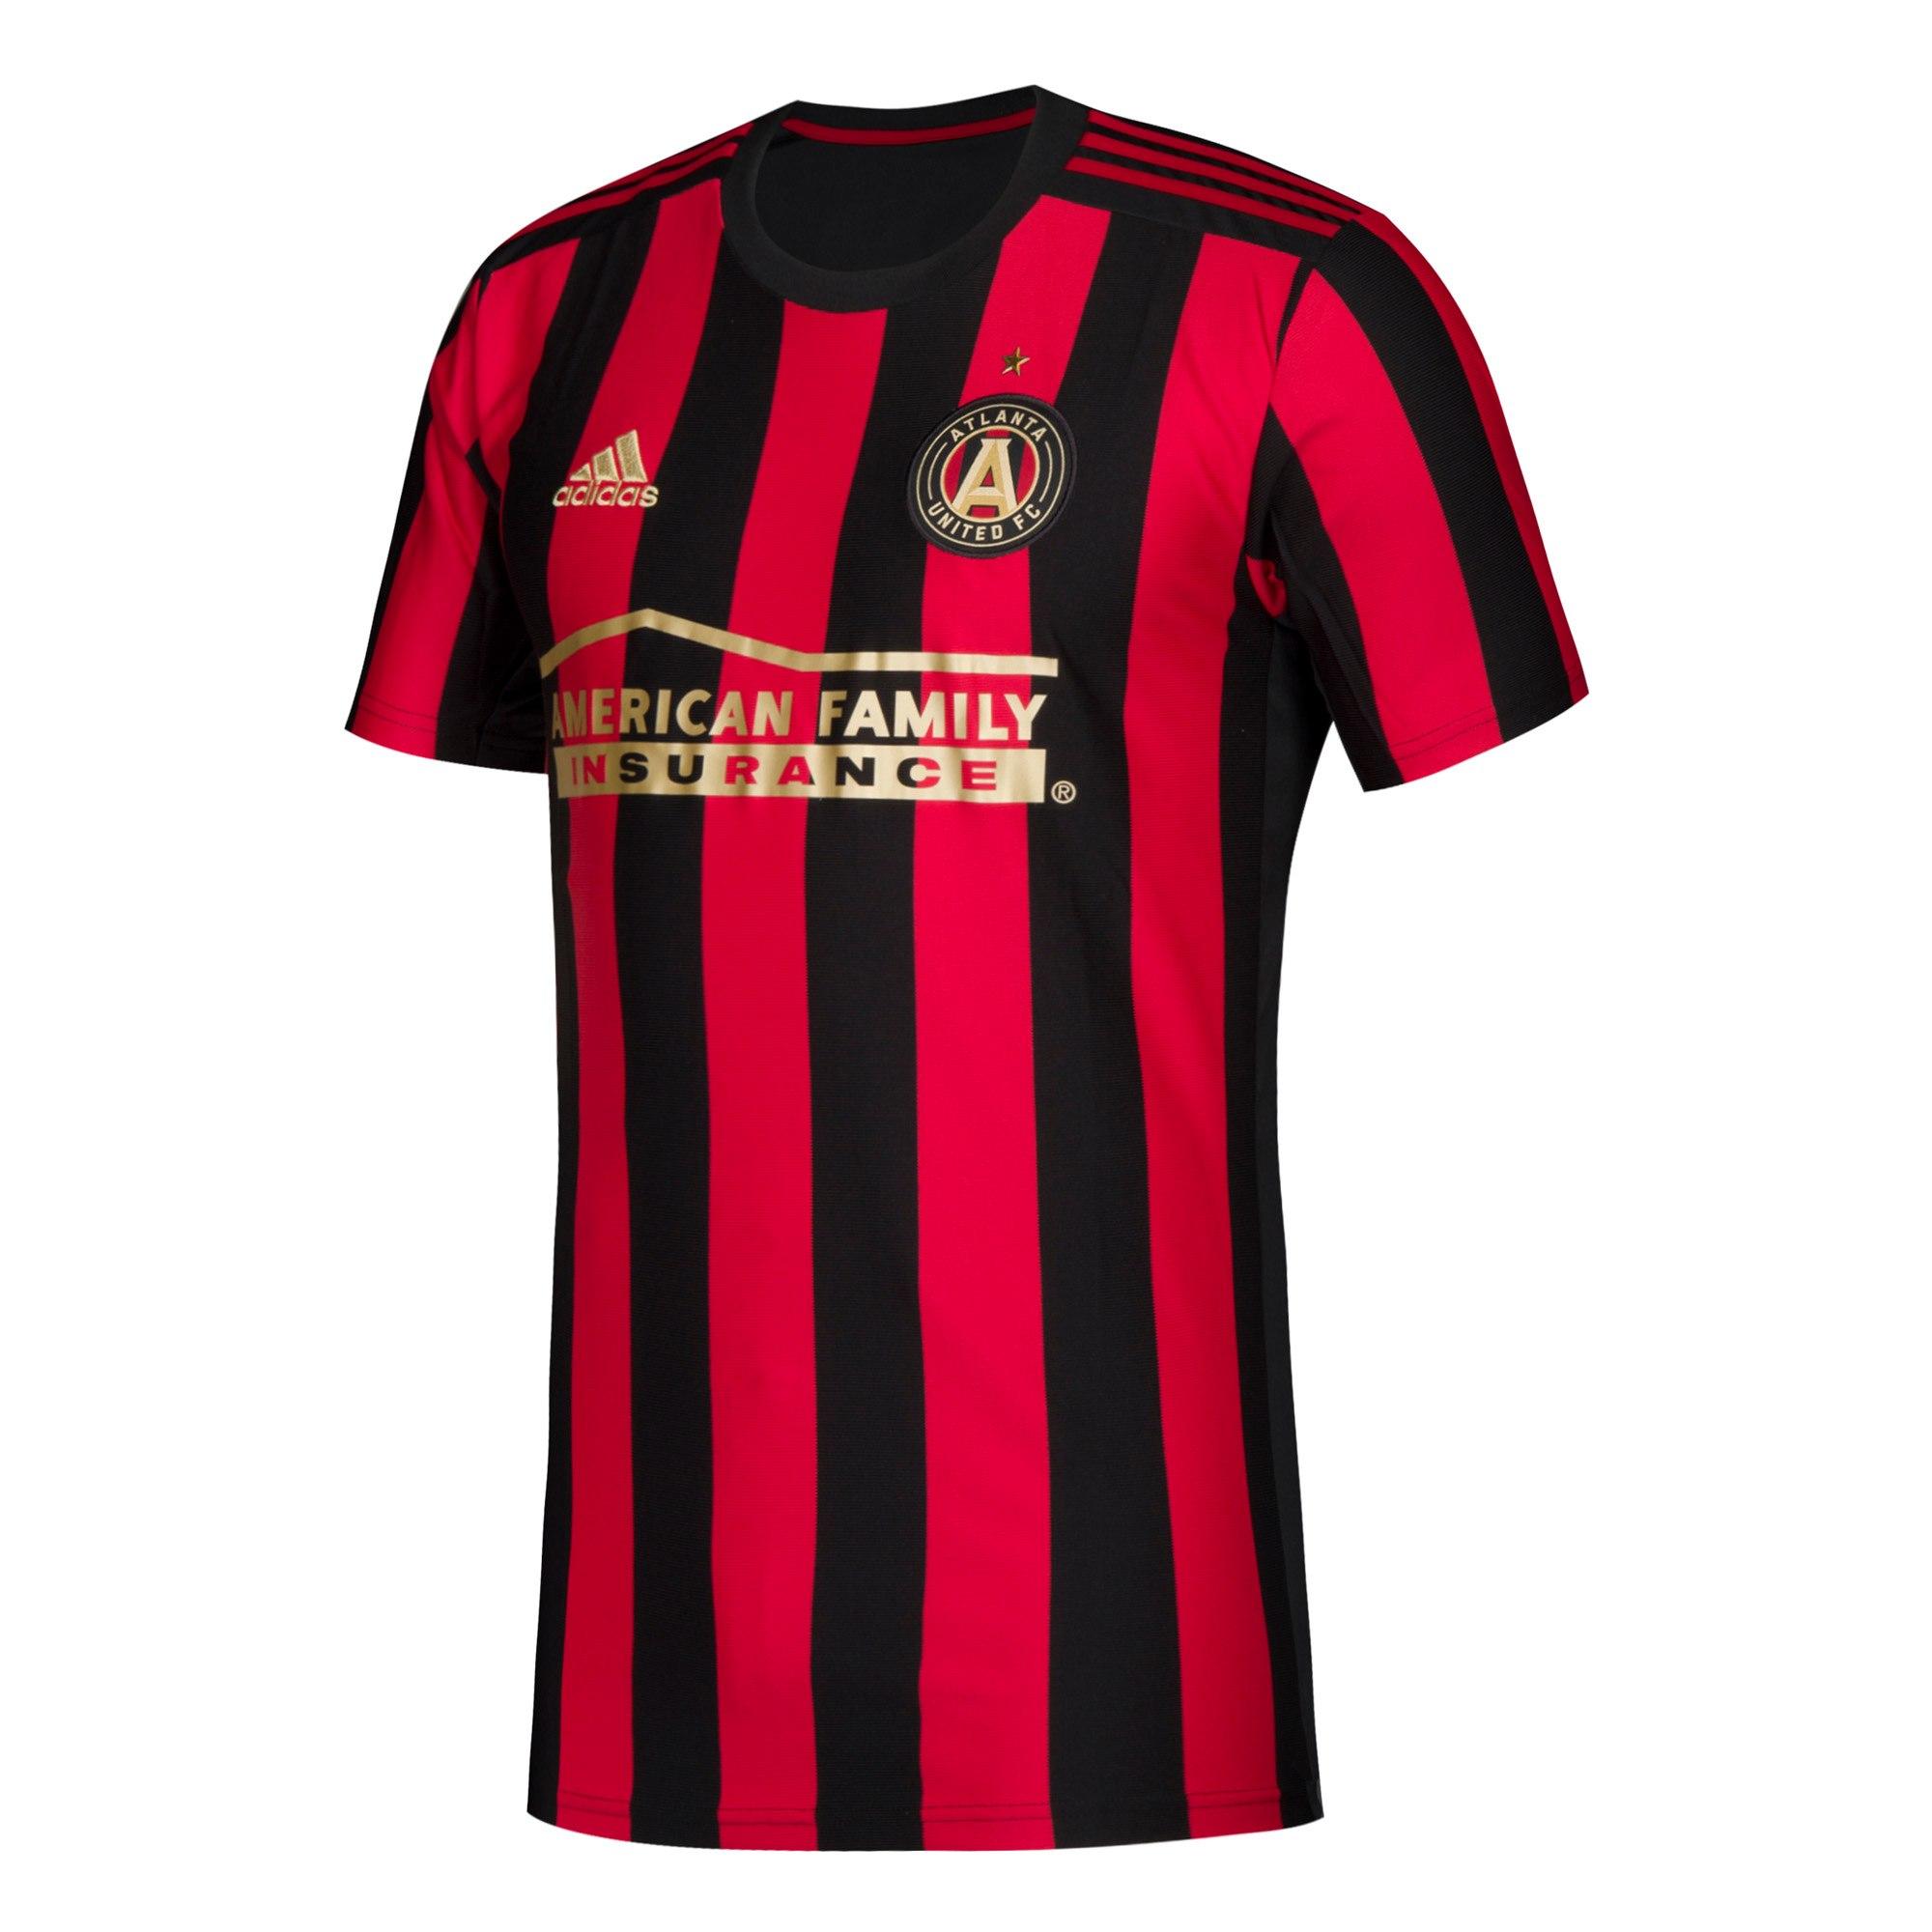 8b4f60e6e84 US  15.8 - Atlanta United FC Away Jersey Men s 2019 20 -  www.fcsoccerworld.com